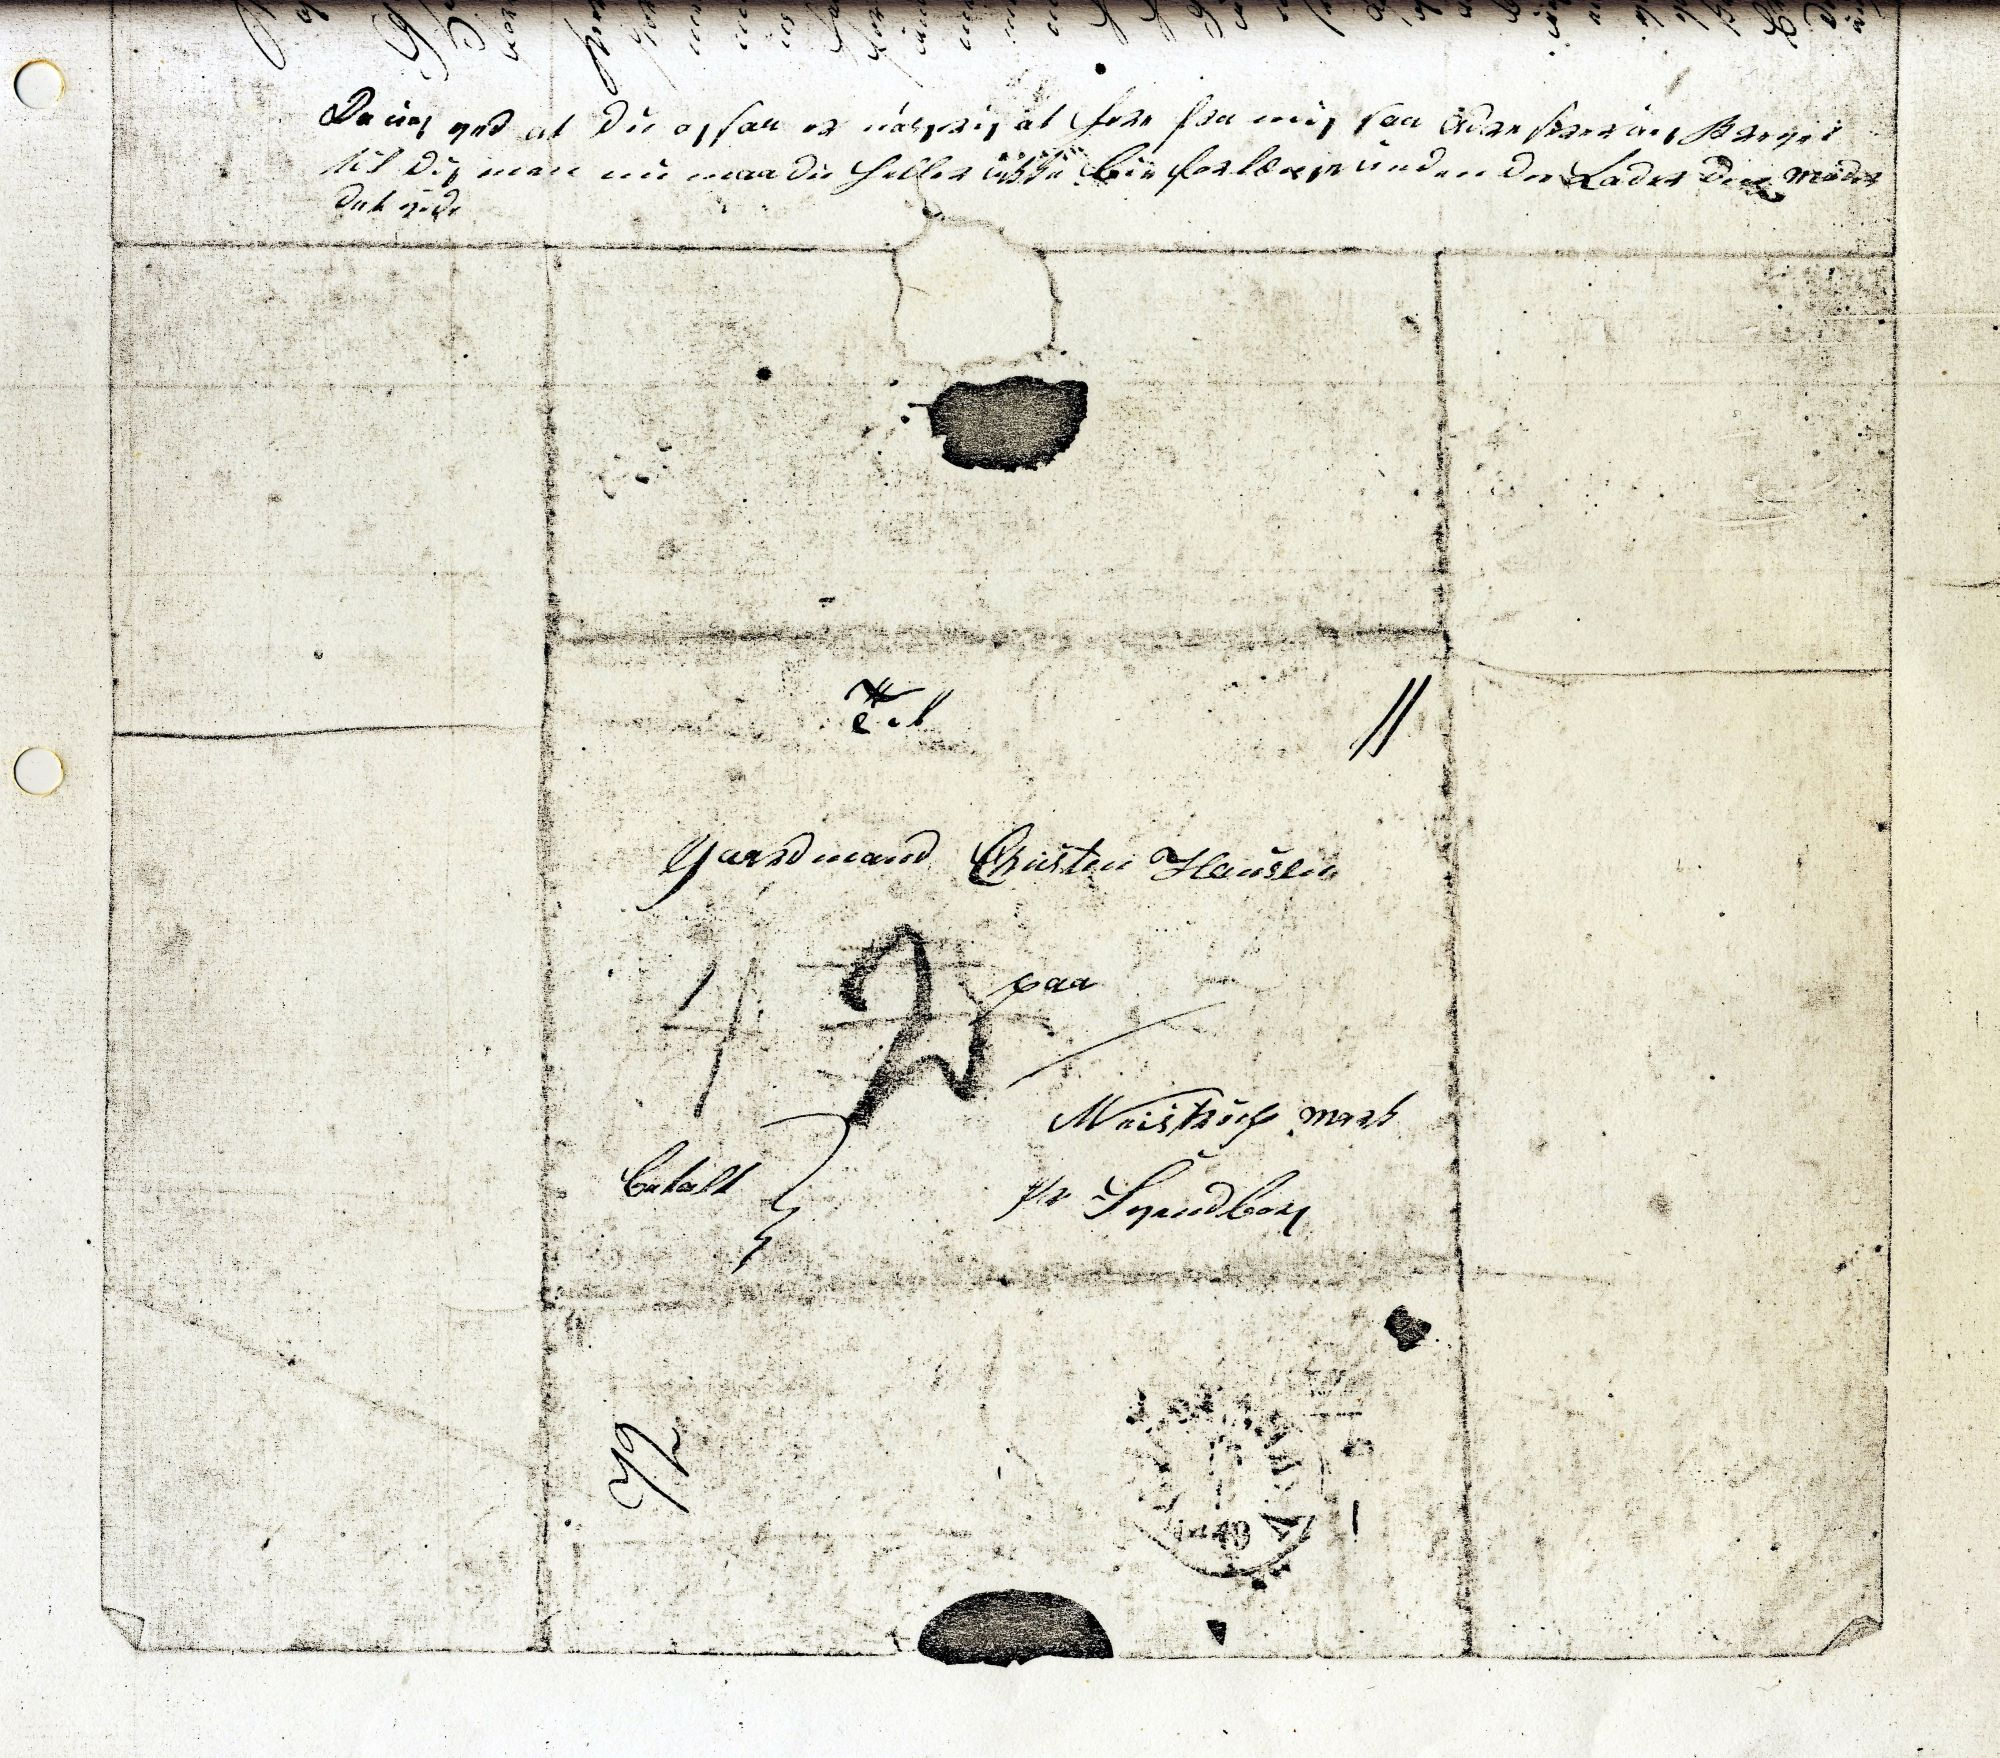 Politiker Hans Christensen brev 16.-1- 1849